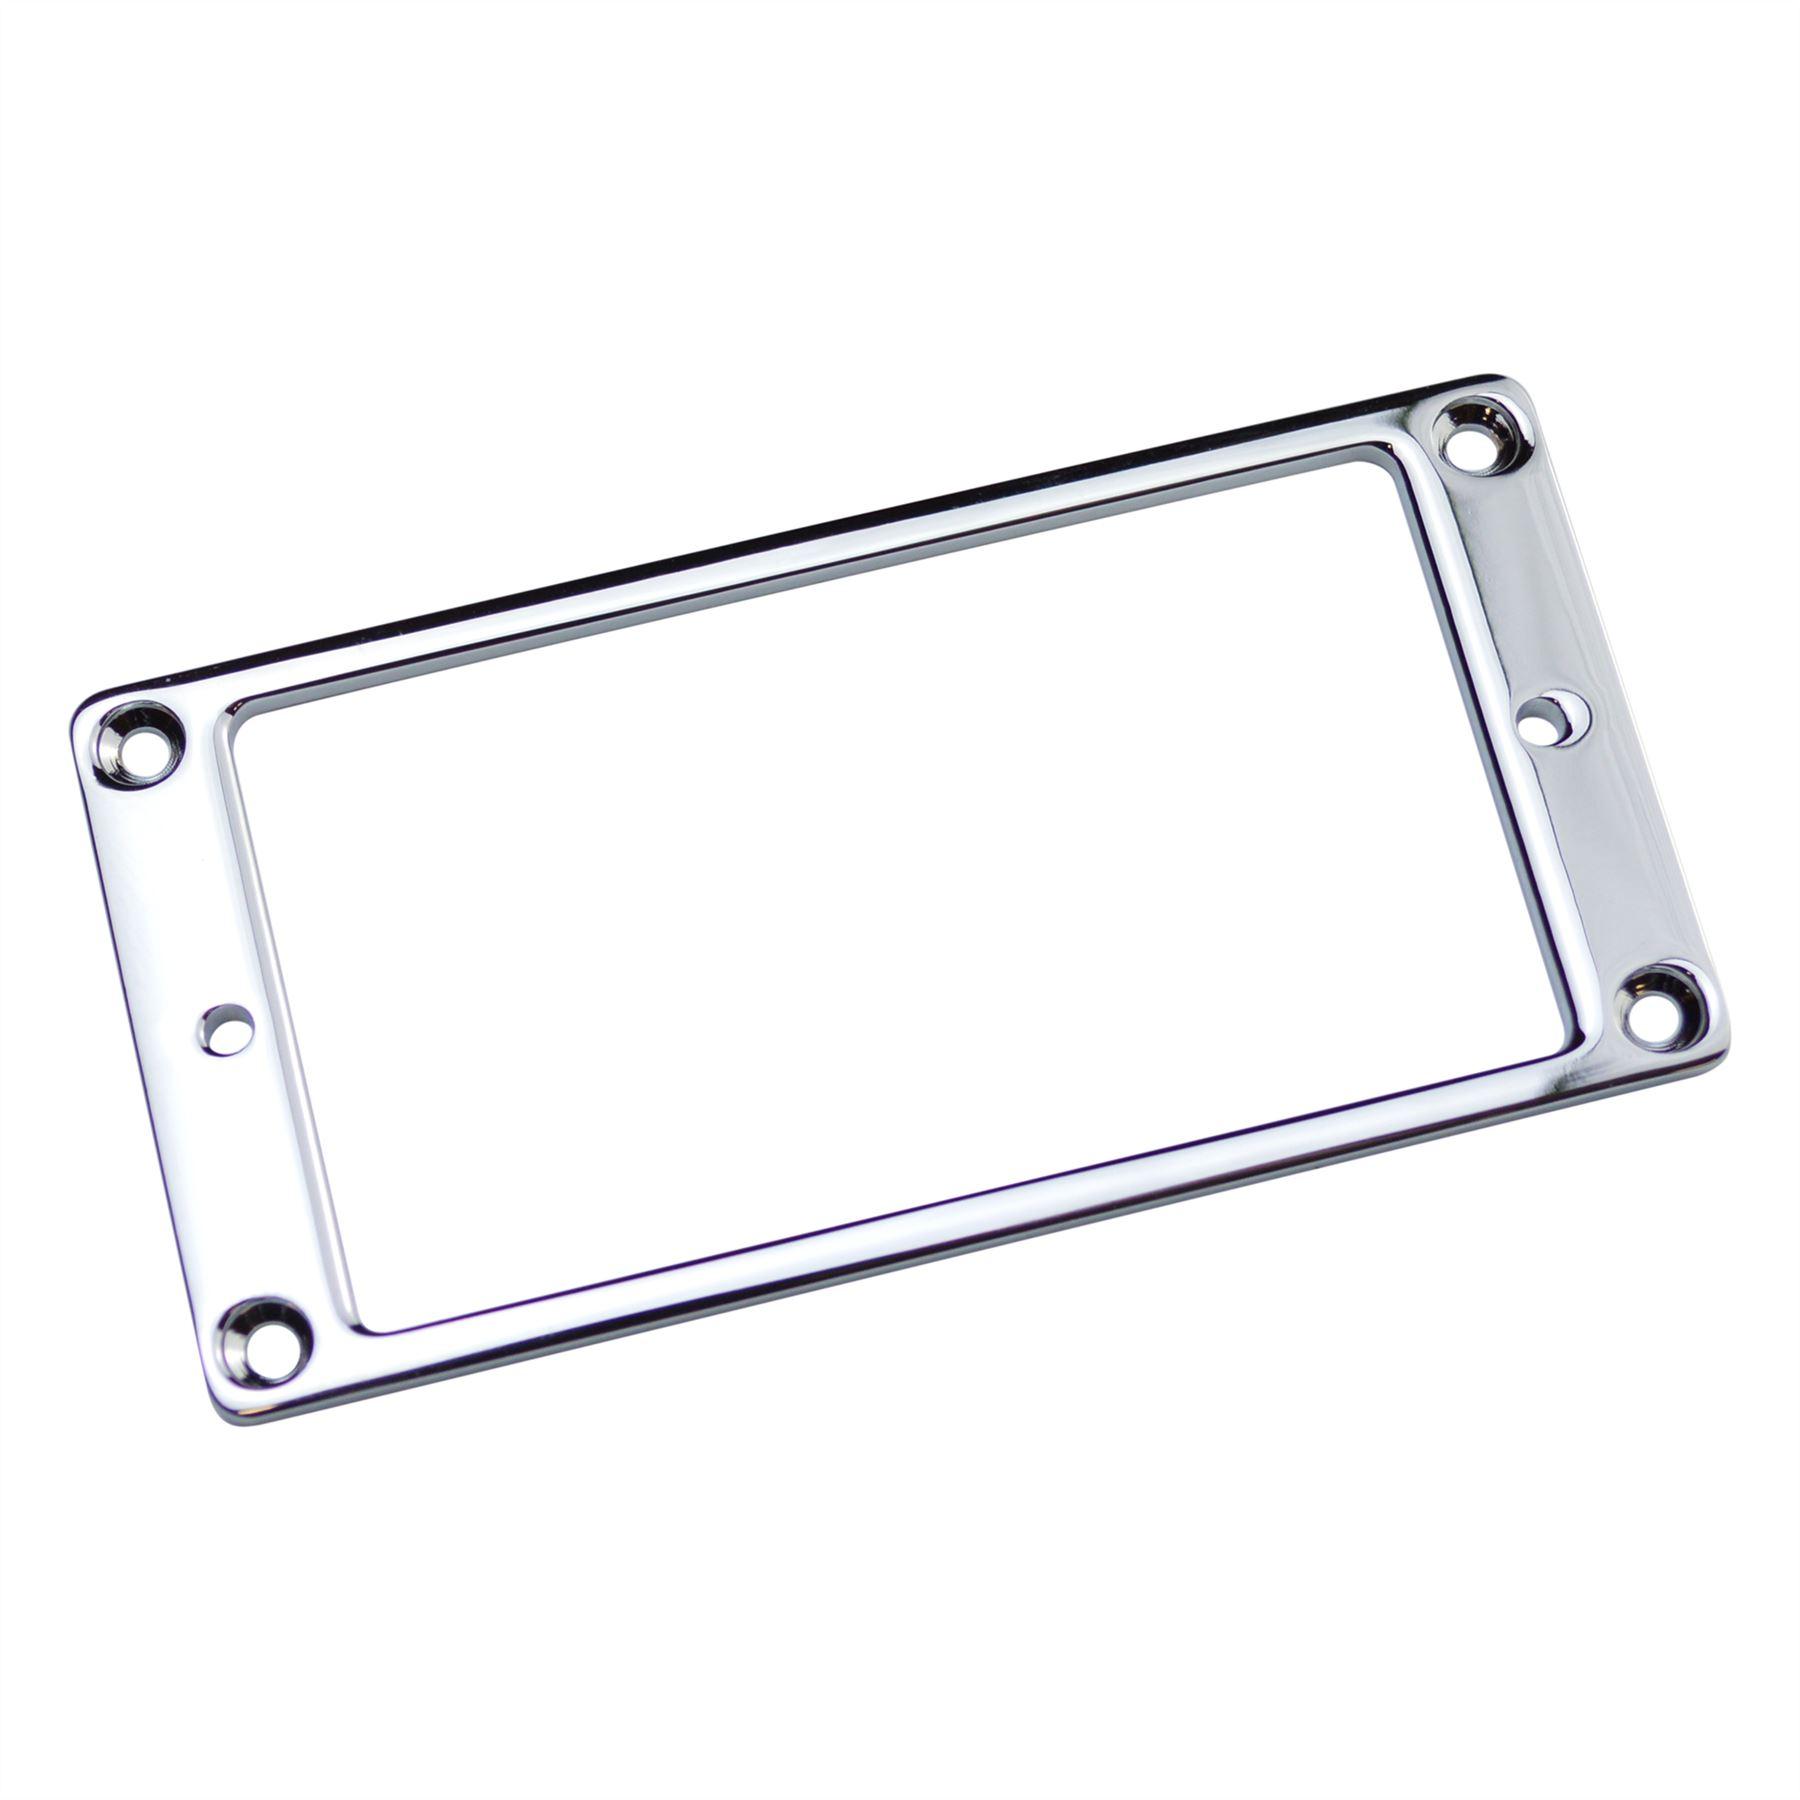 Flat Metal Humbucker Pickup Surround Plate